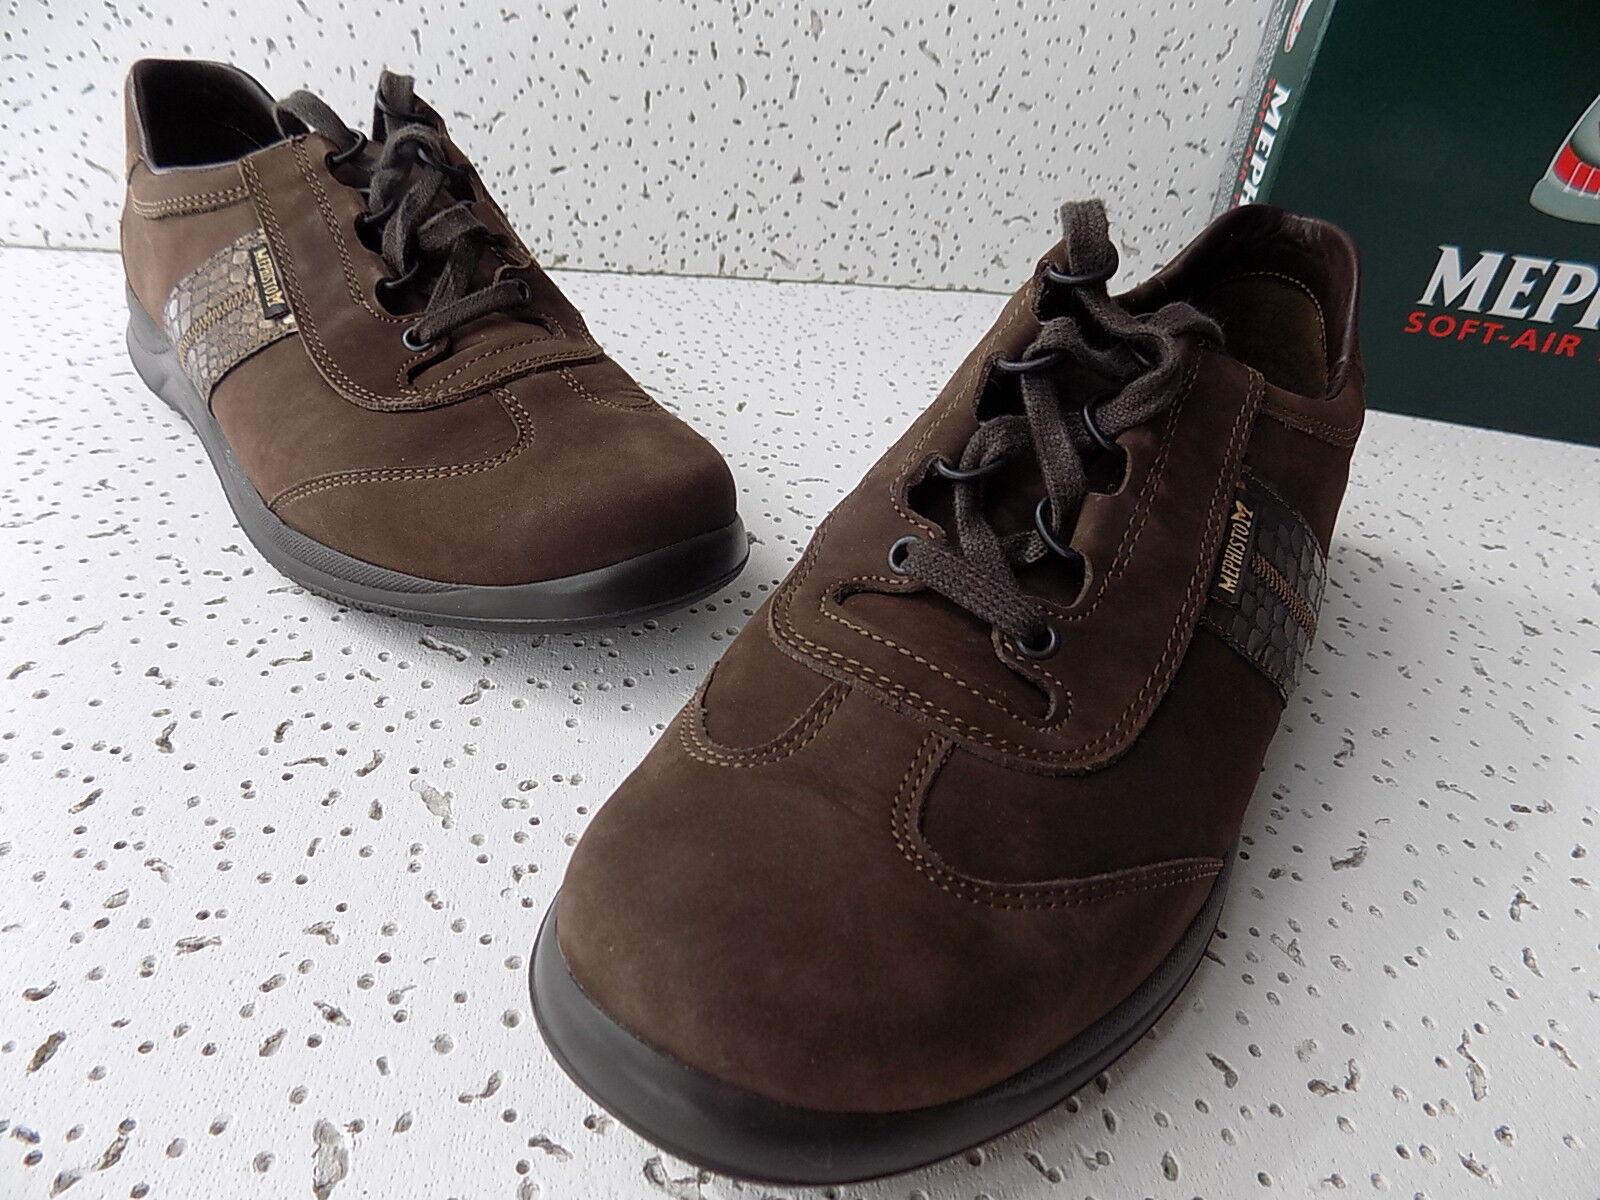 EUC Mephisto Damenschuhe Laser Perf Chestnut Leder Walking Sneakers Schuhes Größe 8.5M